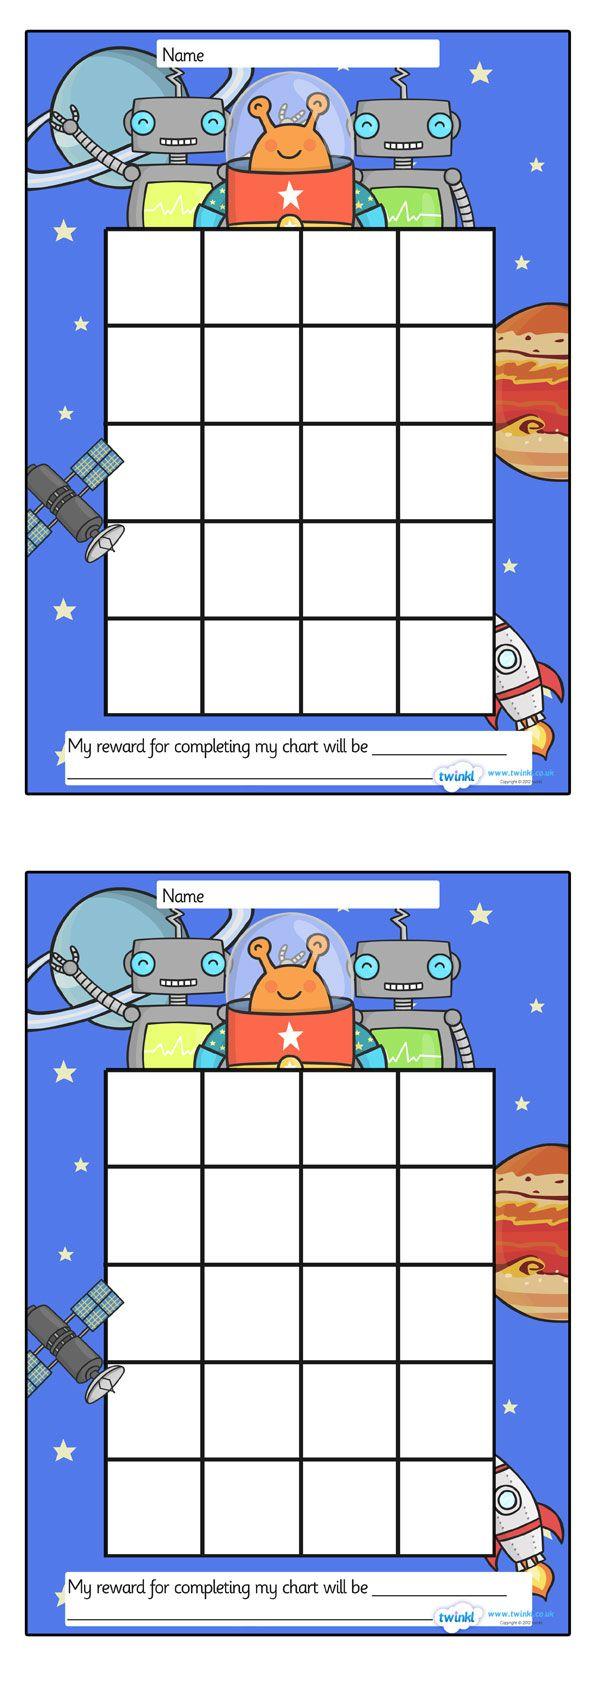 Twinkl Resources >> Space Sticker/Stamp Reward Chart  >> Classroom printables for Pre-School, Kindergarten, Elementary School and beyond! Rewards, Sticker Charts, Class Management, Behavior